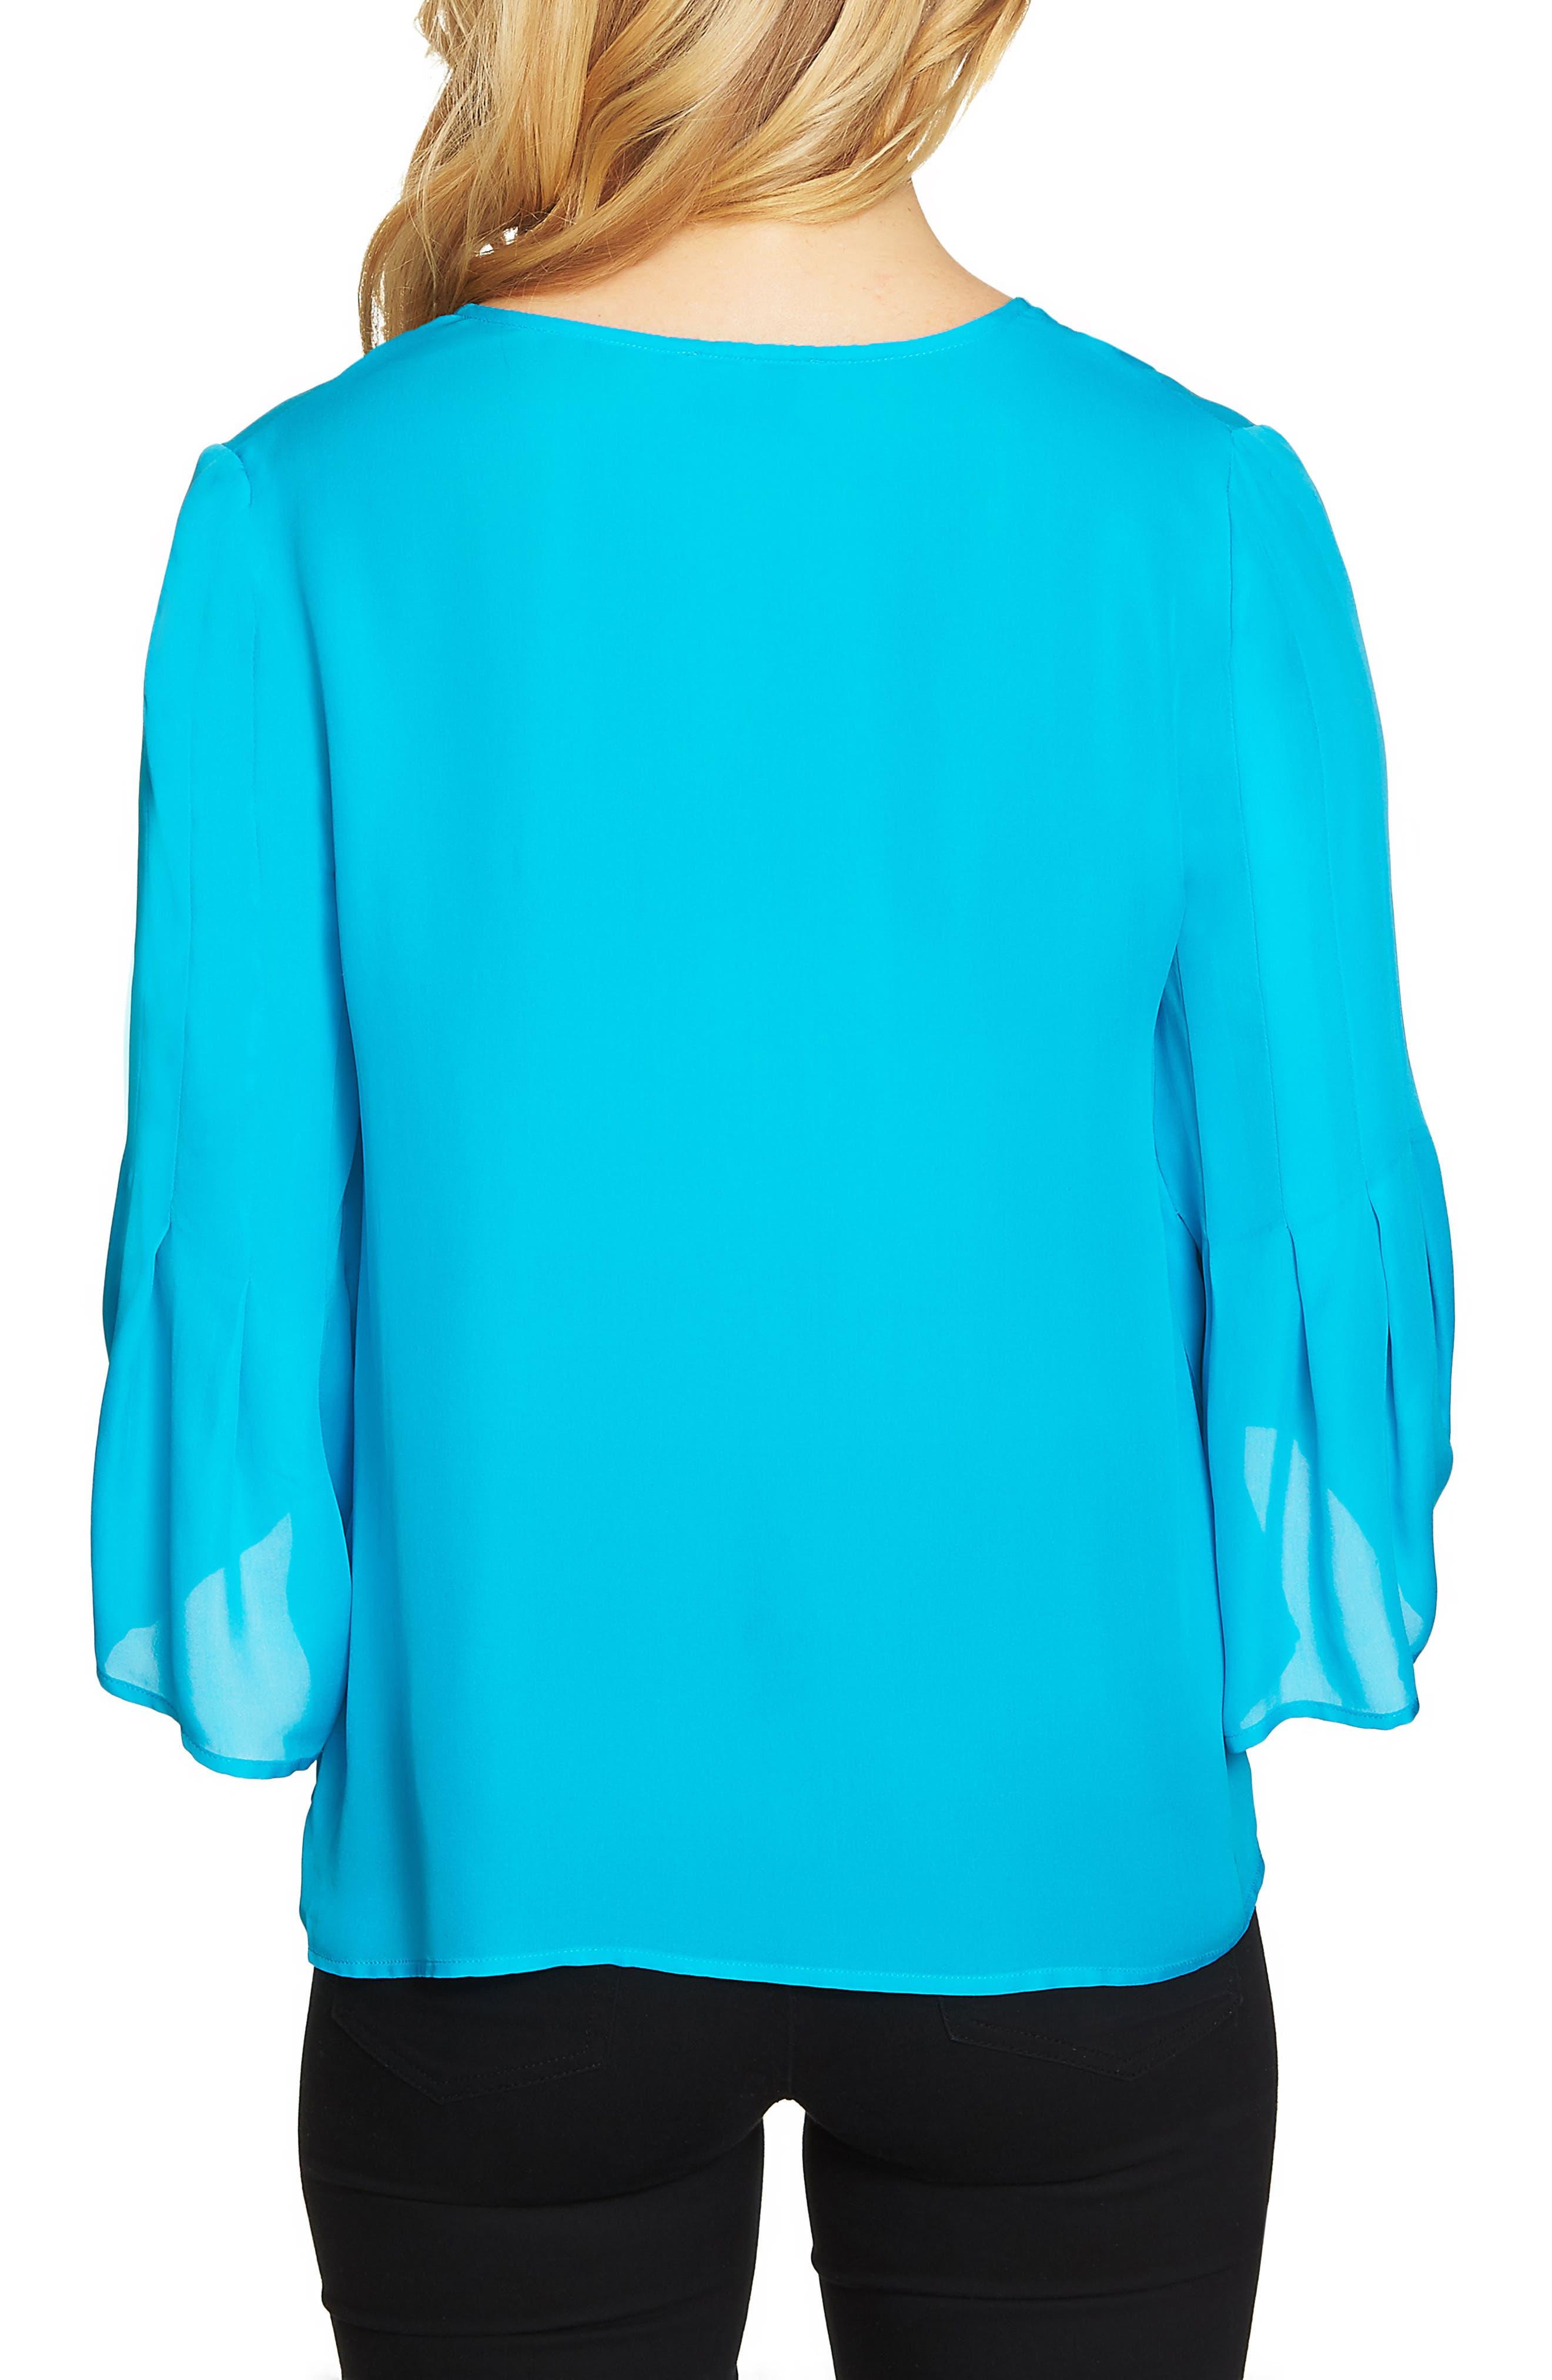 Flare Sleeve Blouse,                             Alternate thumbnail 2, color,                             Blue Morning